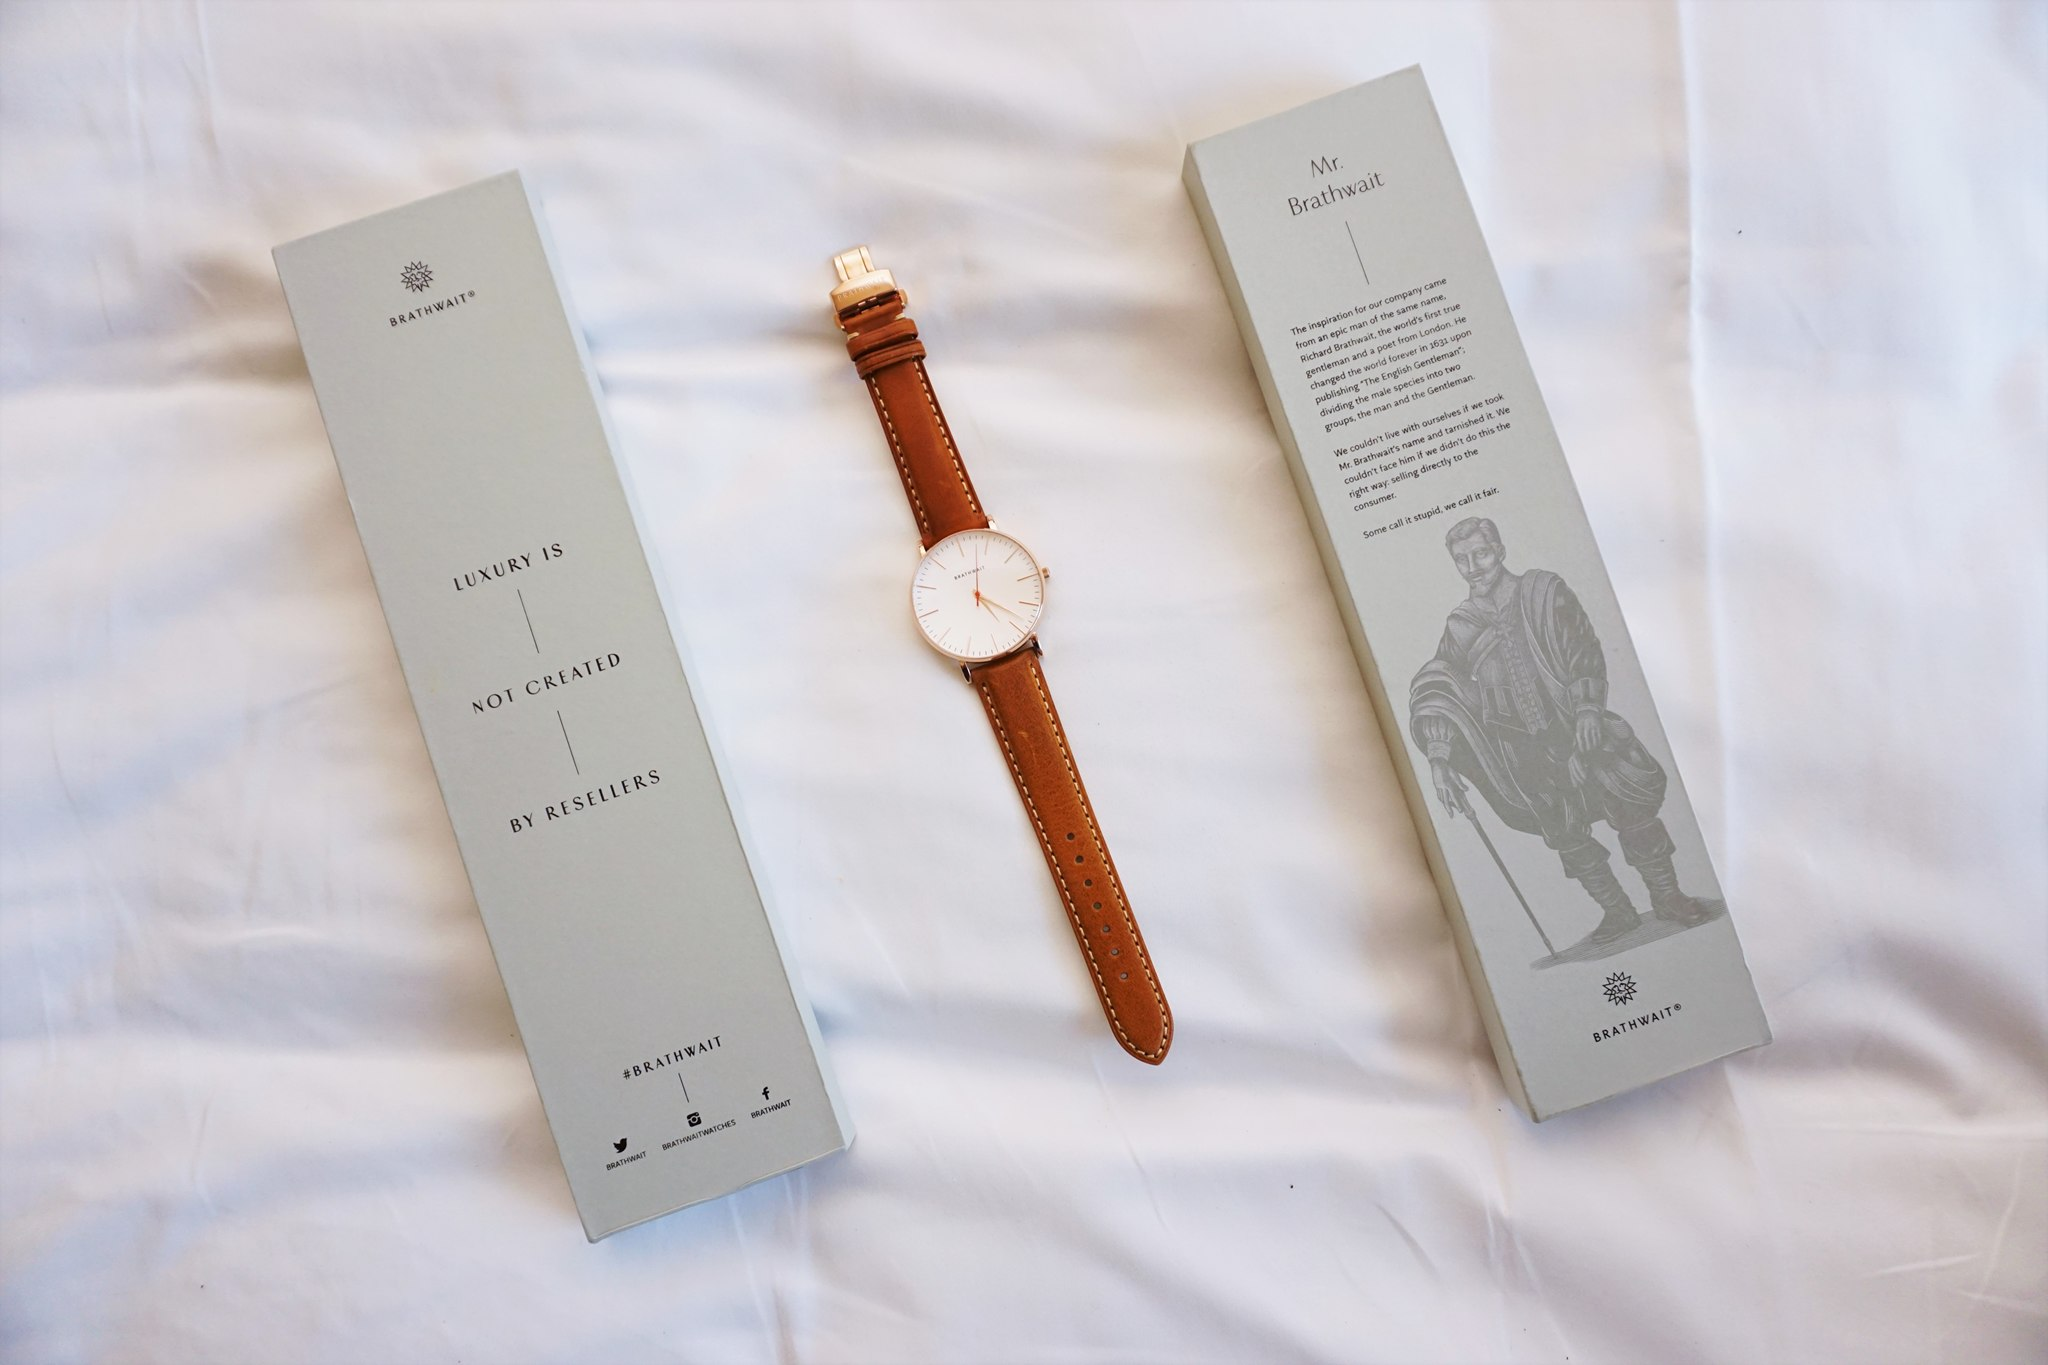 brathwait-classic-slim-mens-watch-8-marron-top-grain-italian-calf-leather-strap